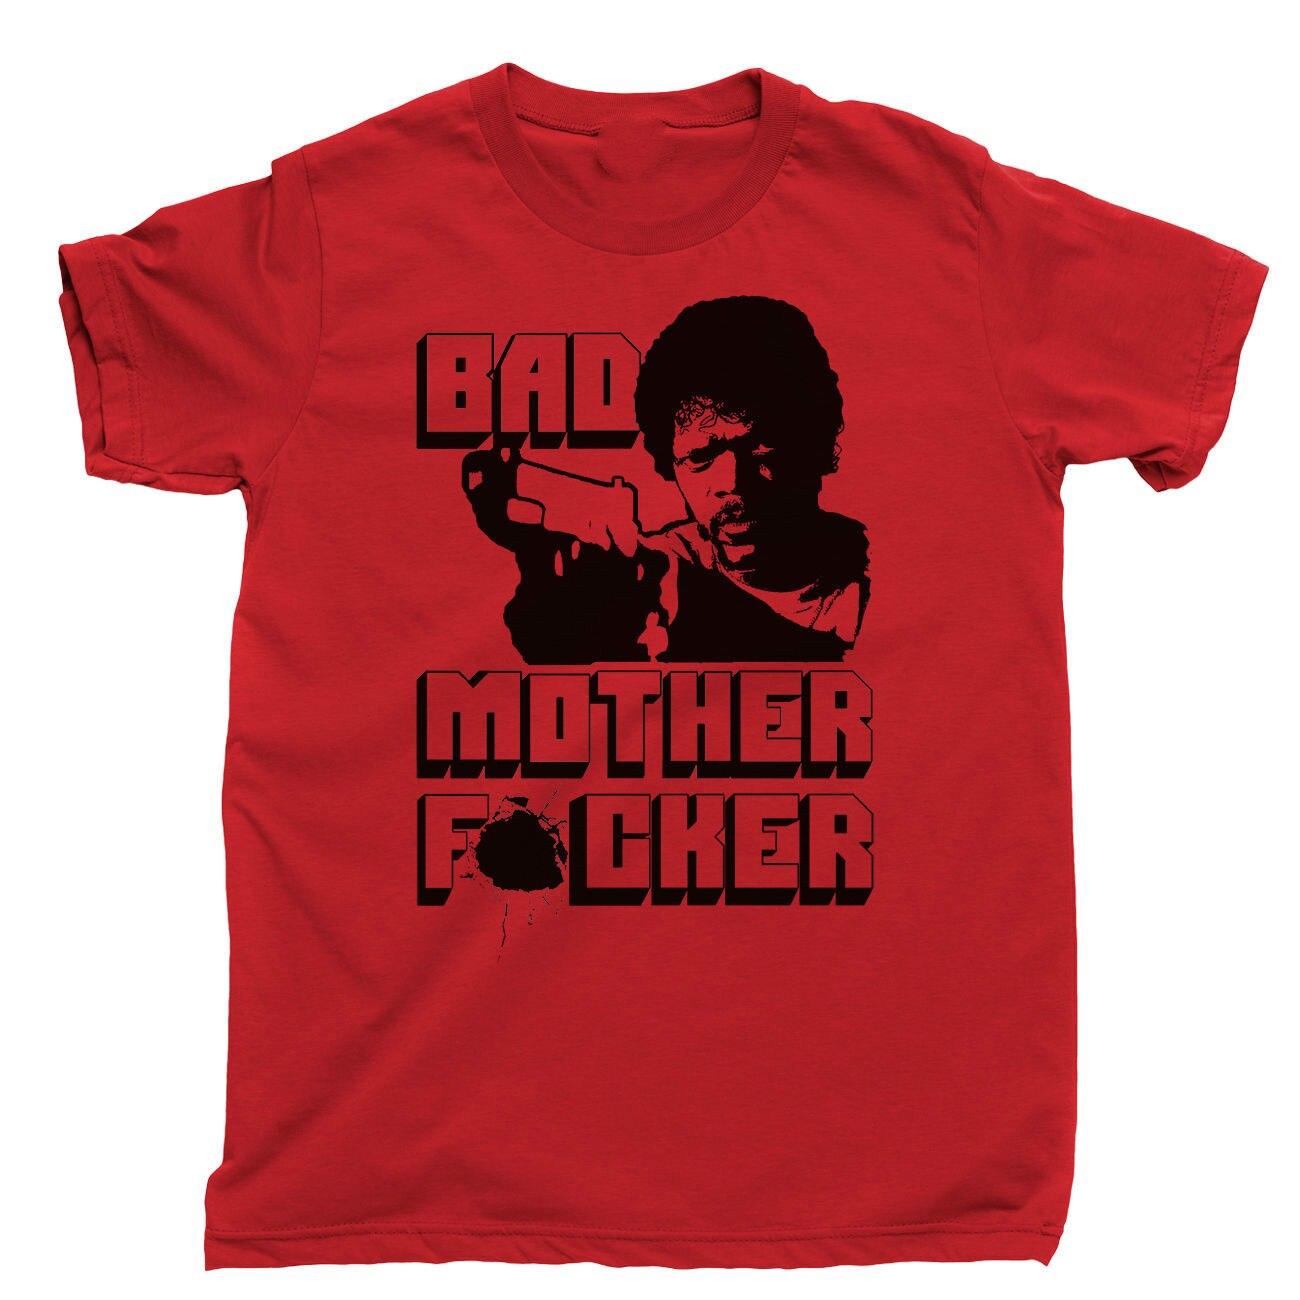 bad-mofo-t-shirt-pulp-fiction-quentin-font-b-tarantino-b-font-samuel-l-jackson-blu-ray-dvd-tee-summer-short-sleeve-shirts-tops-s~3xl-big-size